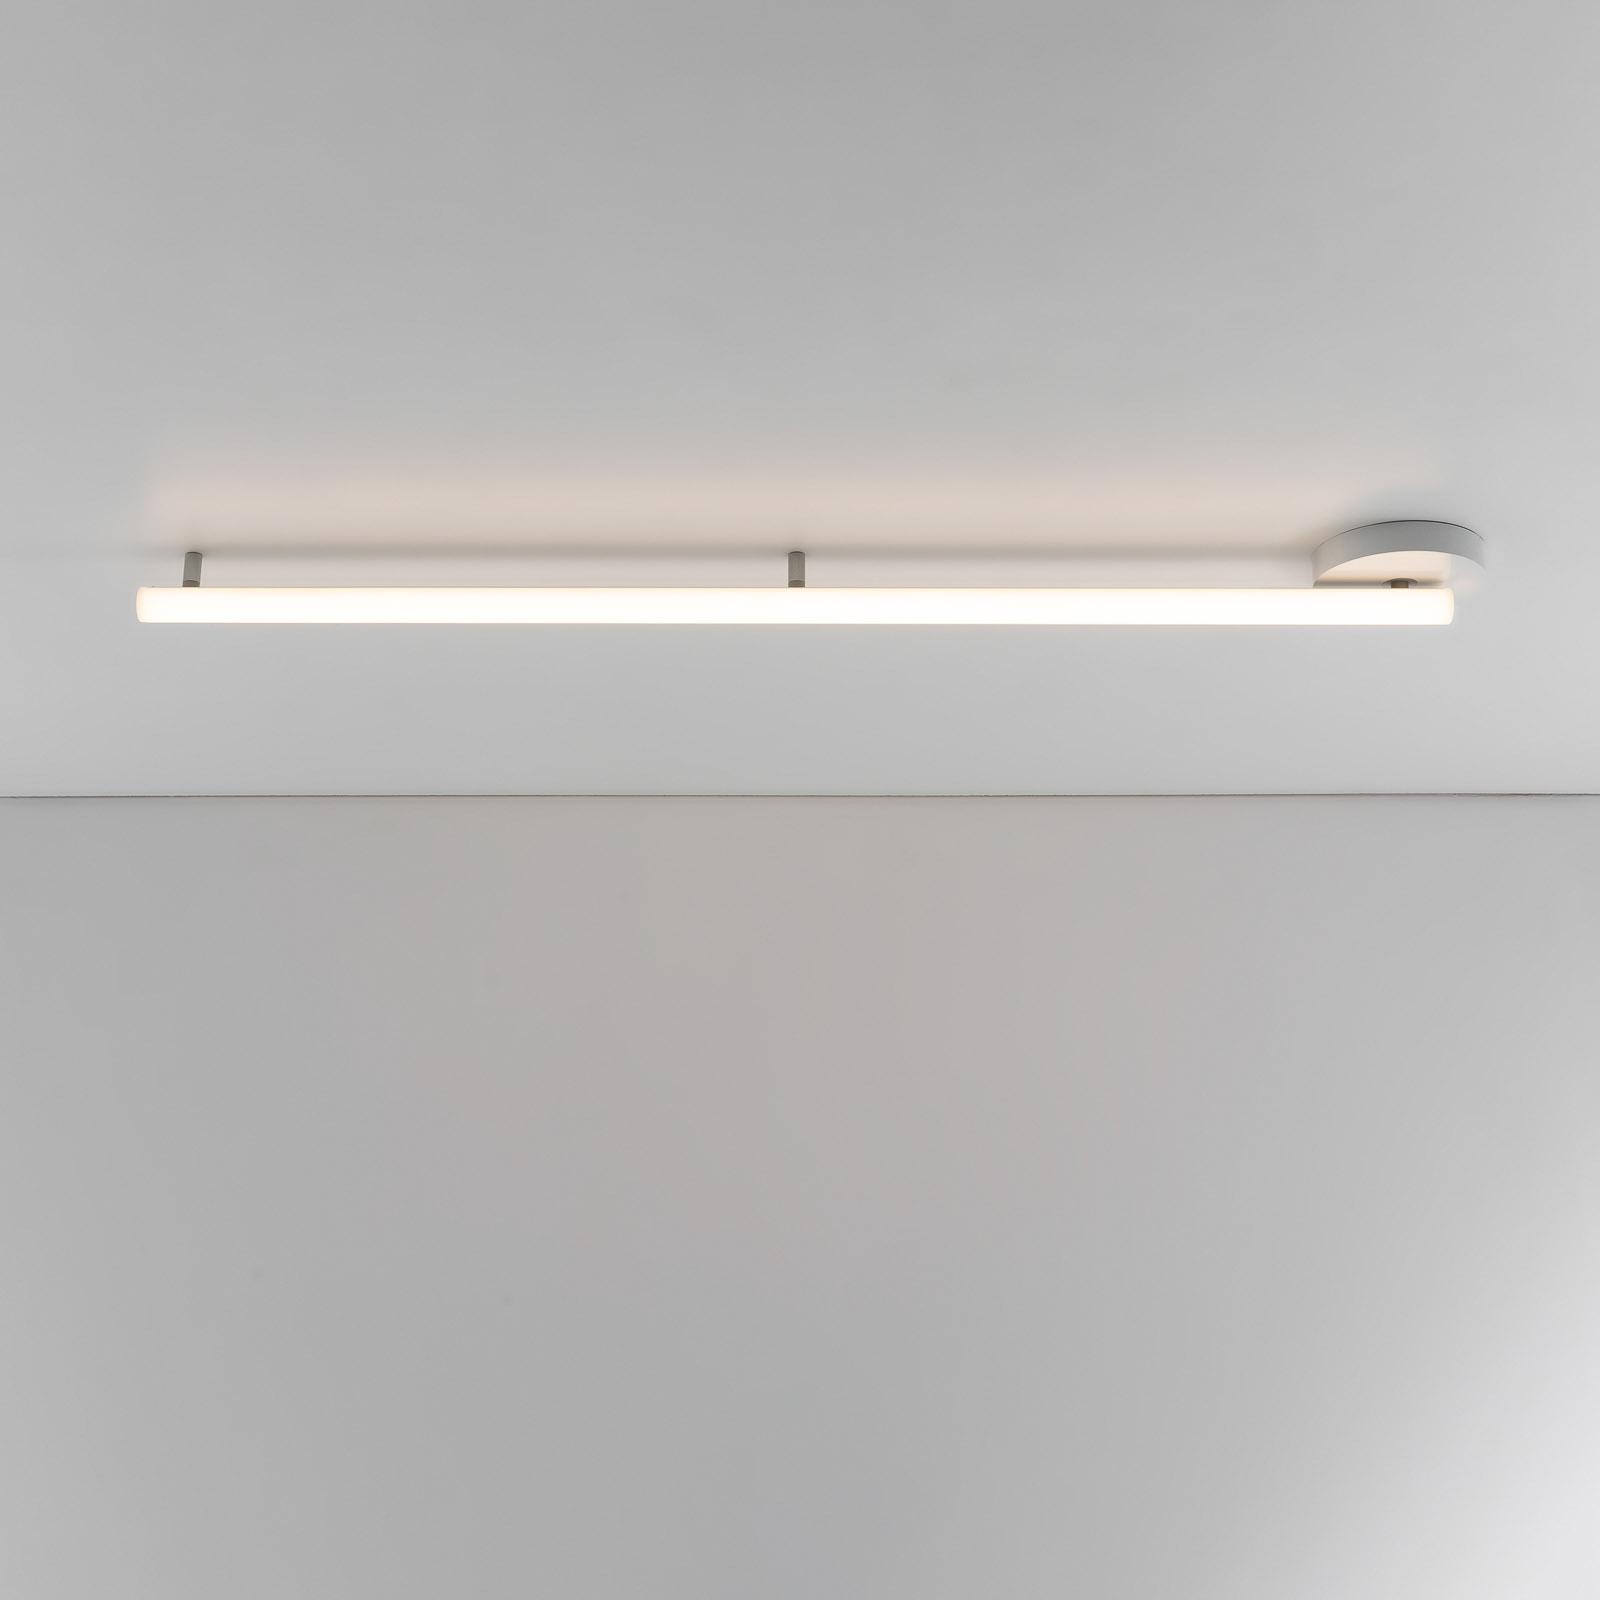 Artemide Alphabet of light linear Decke App 240